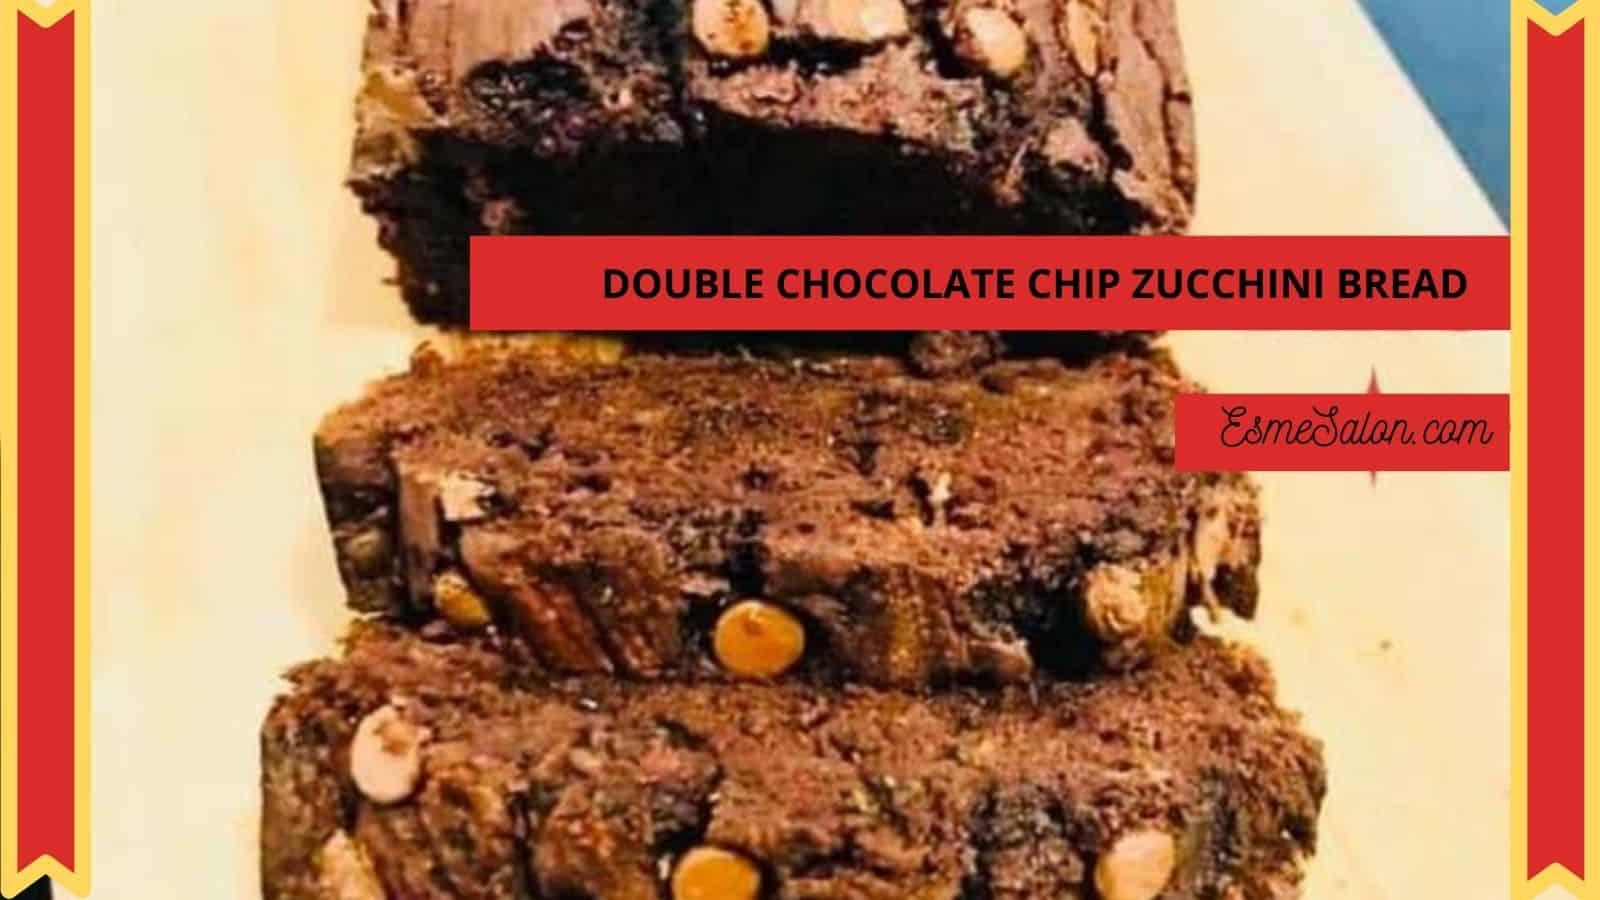 Double Chocolate Chip Zucchini Bread